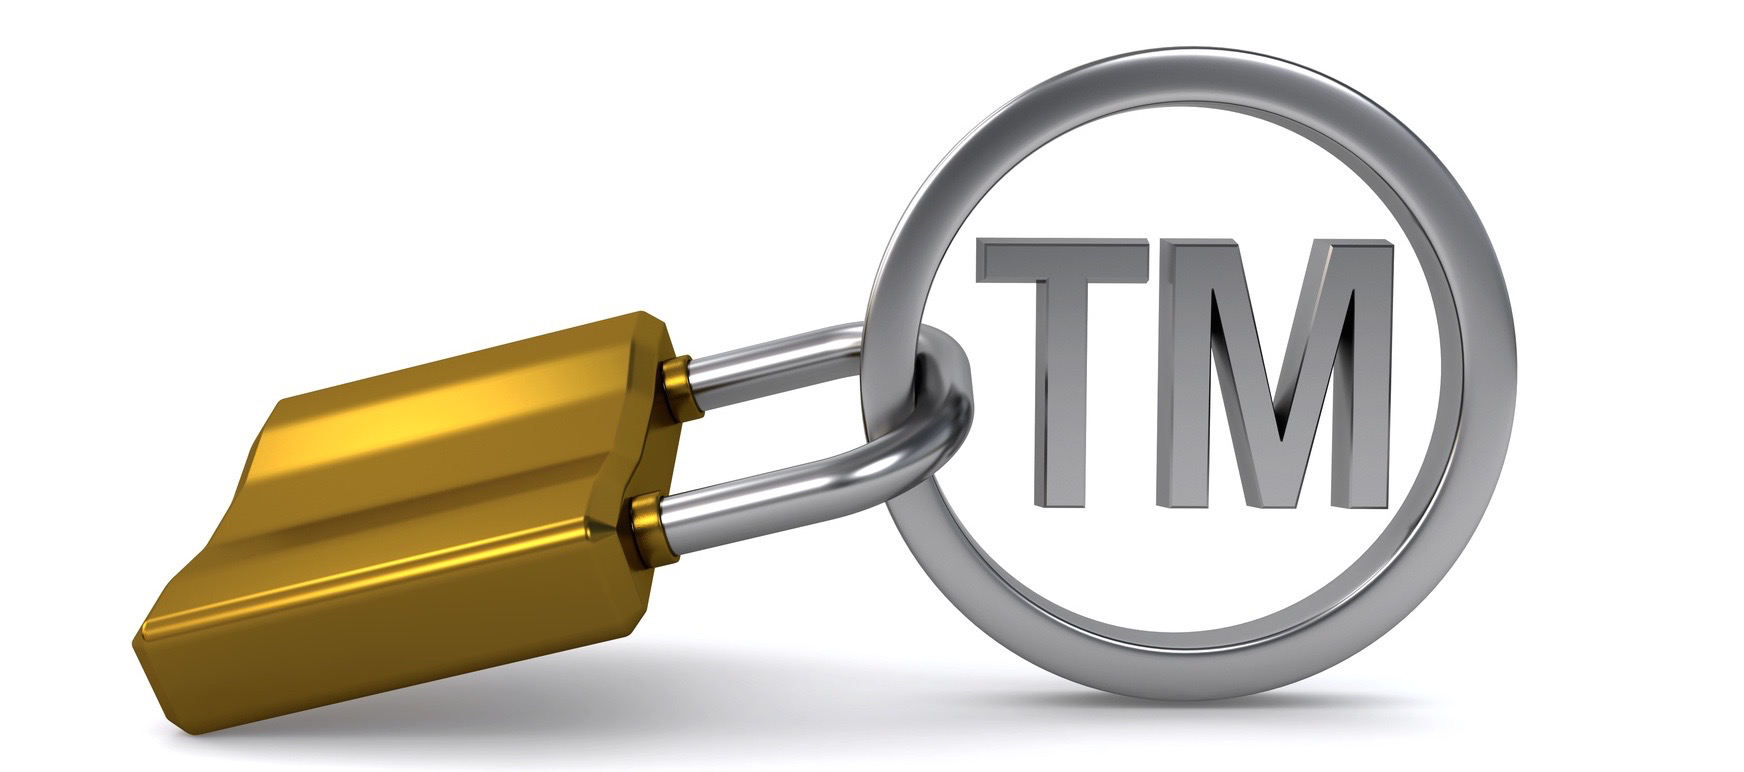 Registered Trademark vs. Common Law Trademark